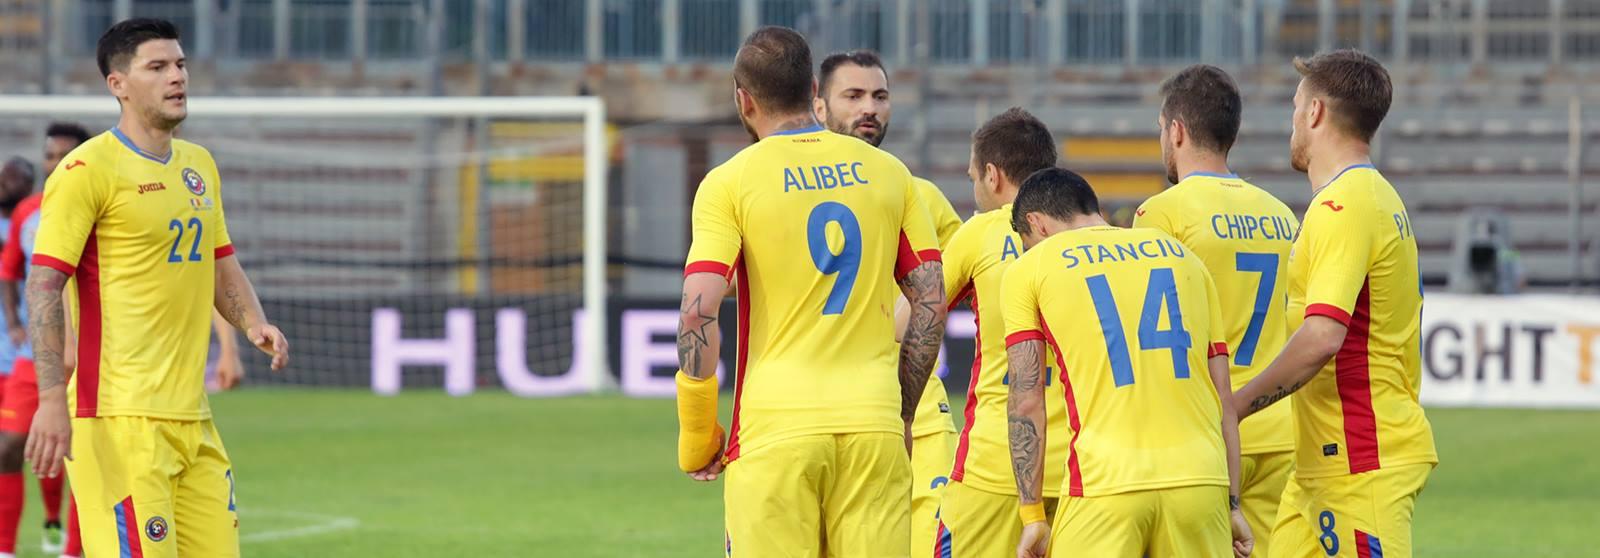 Romania fotbal 2016 viitorul